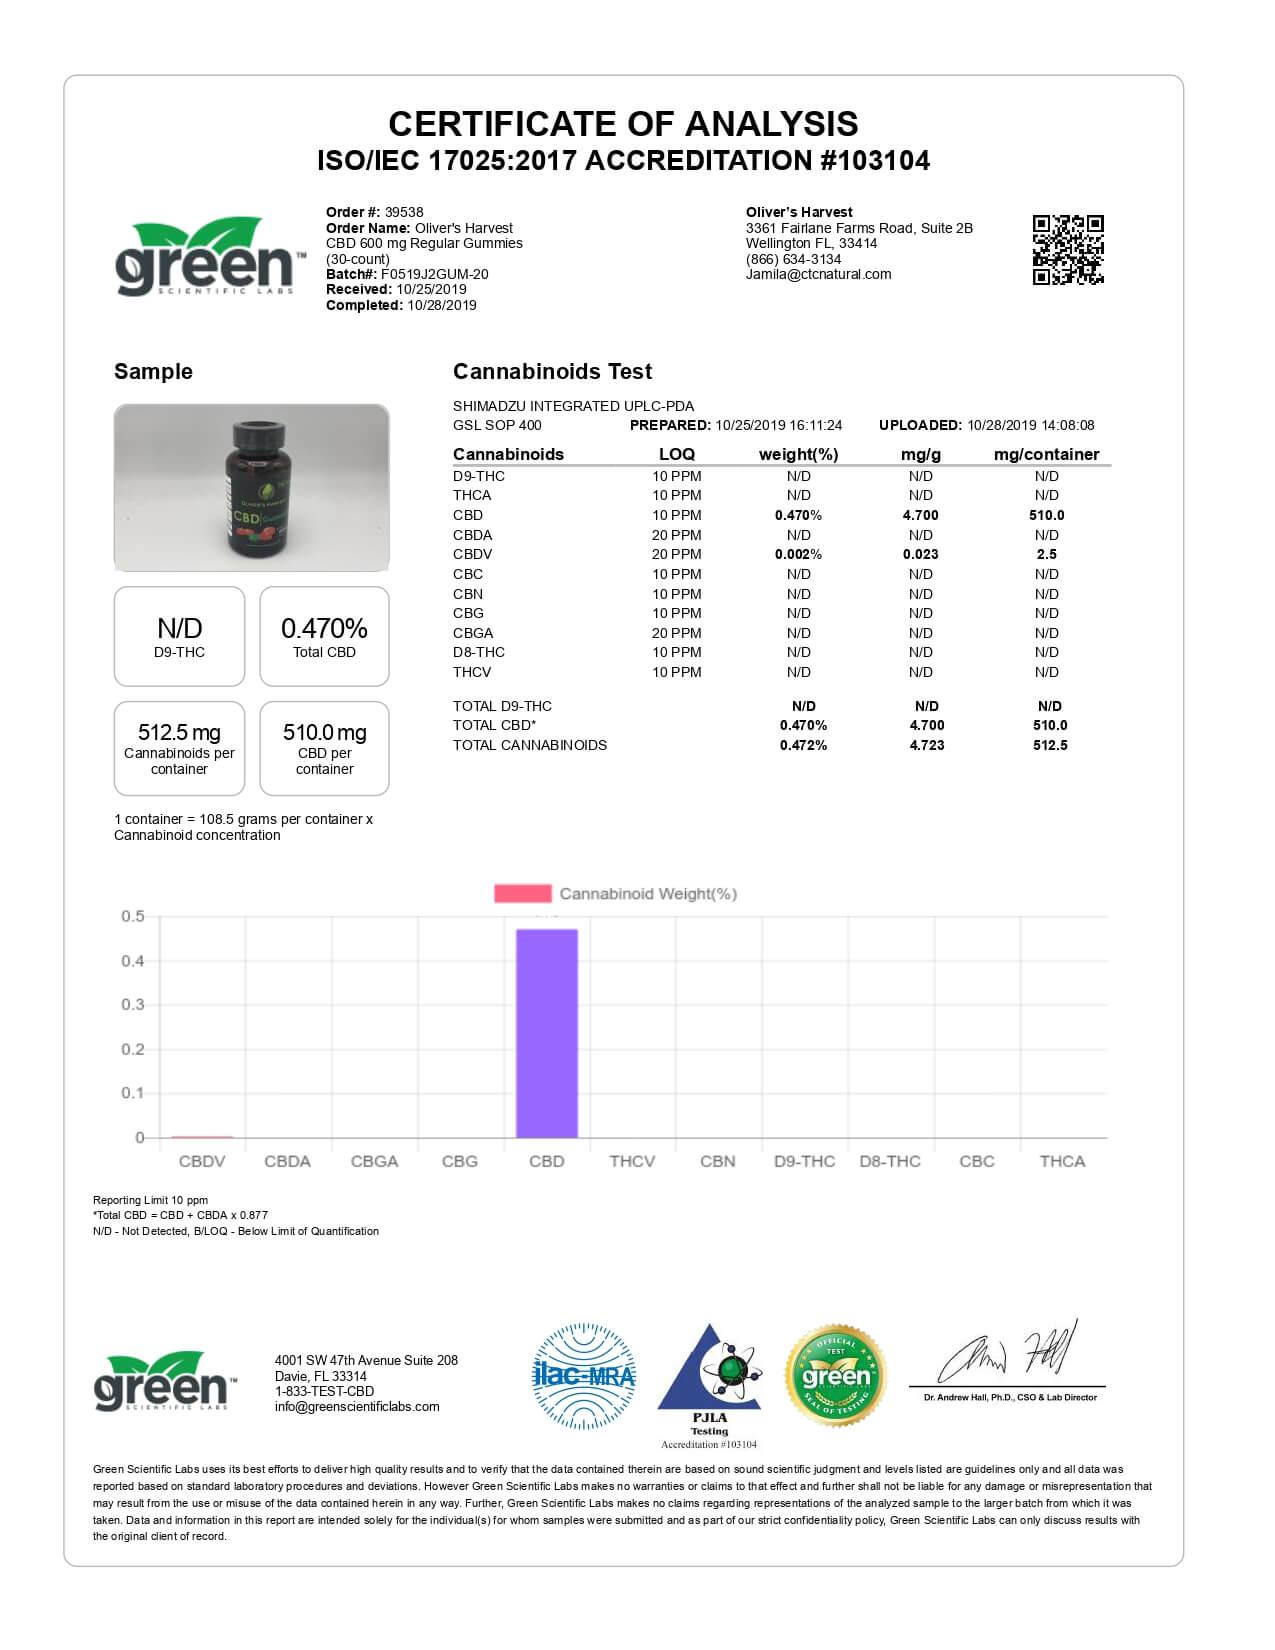 Oliver's Harvest CBD Edible Broad Spectrum Gummies 600mg Lab Report